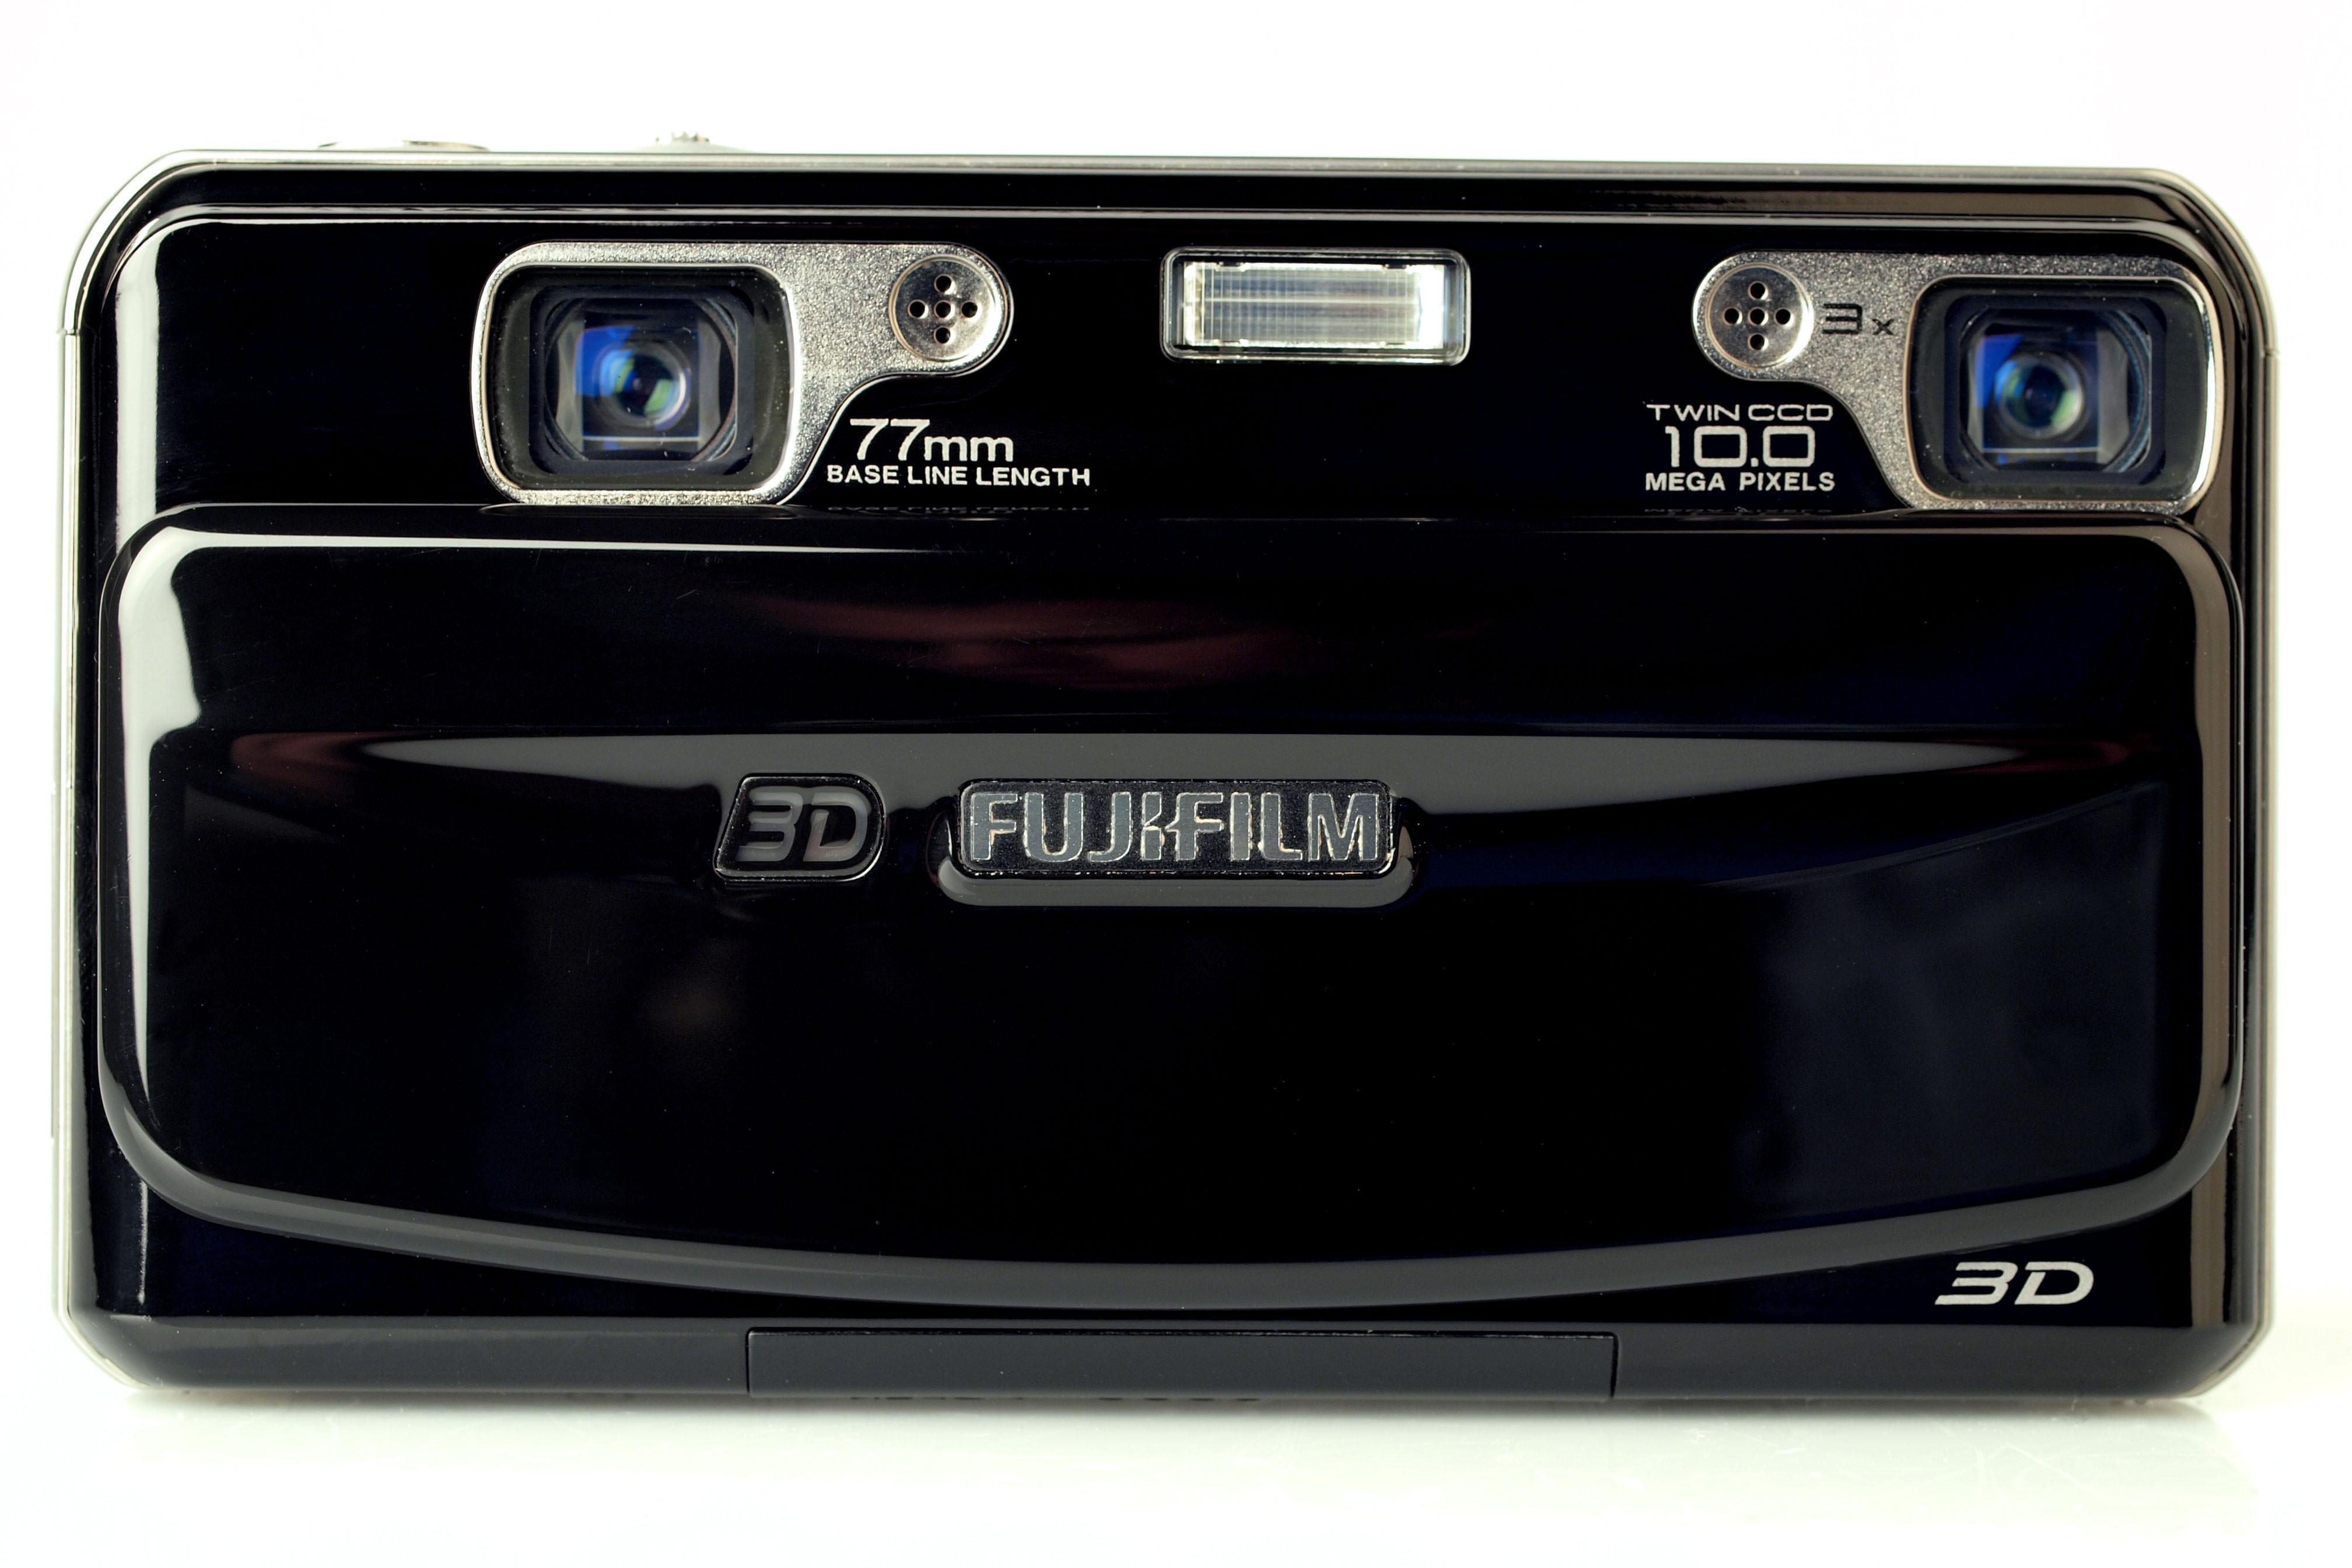 fujifilm w1 real 3d digital camera review rh ephotozine com Fuji S-Series Cameras Fuji S-Series Cameras